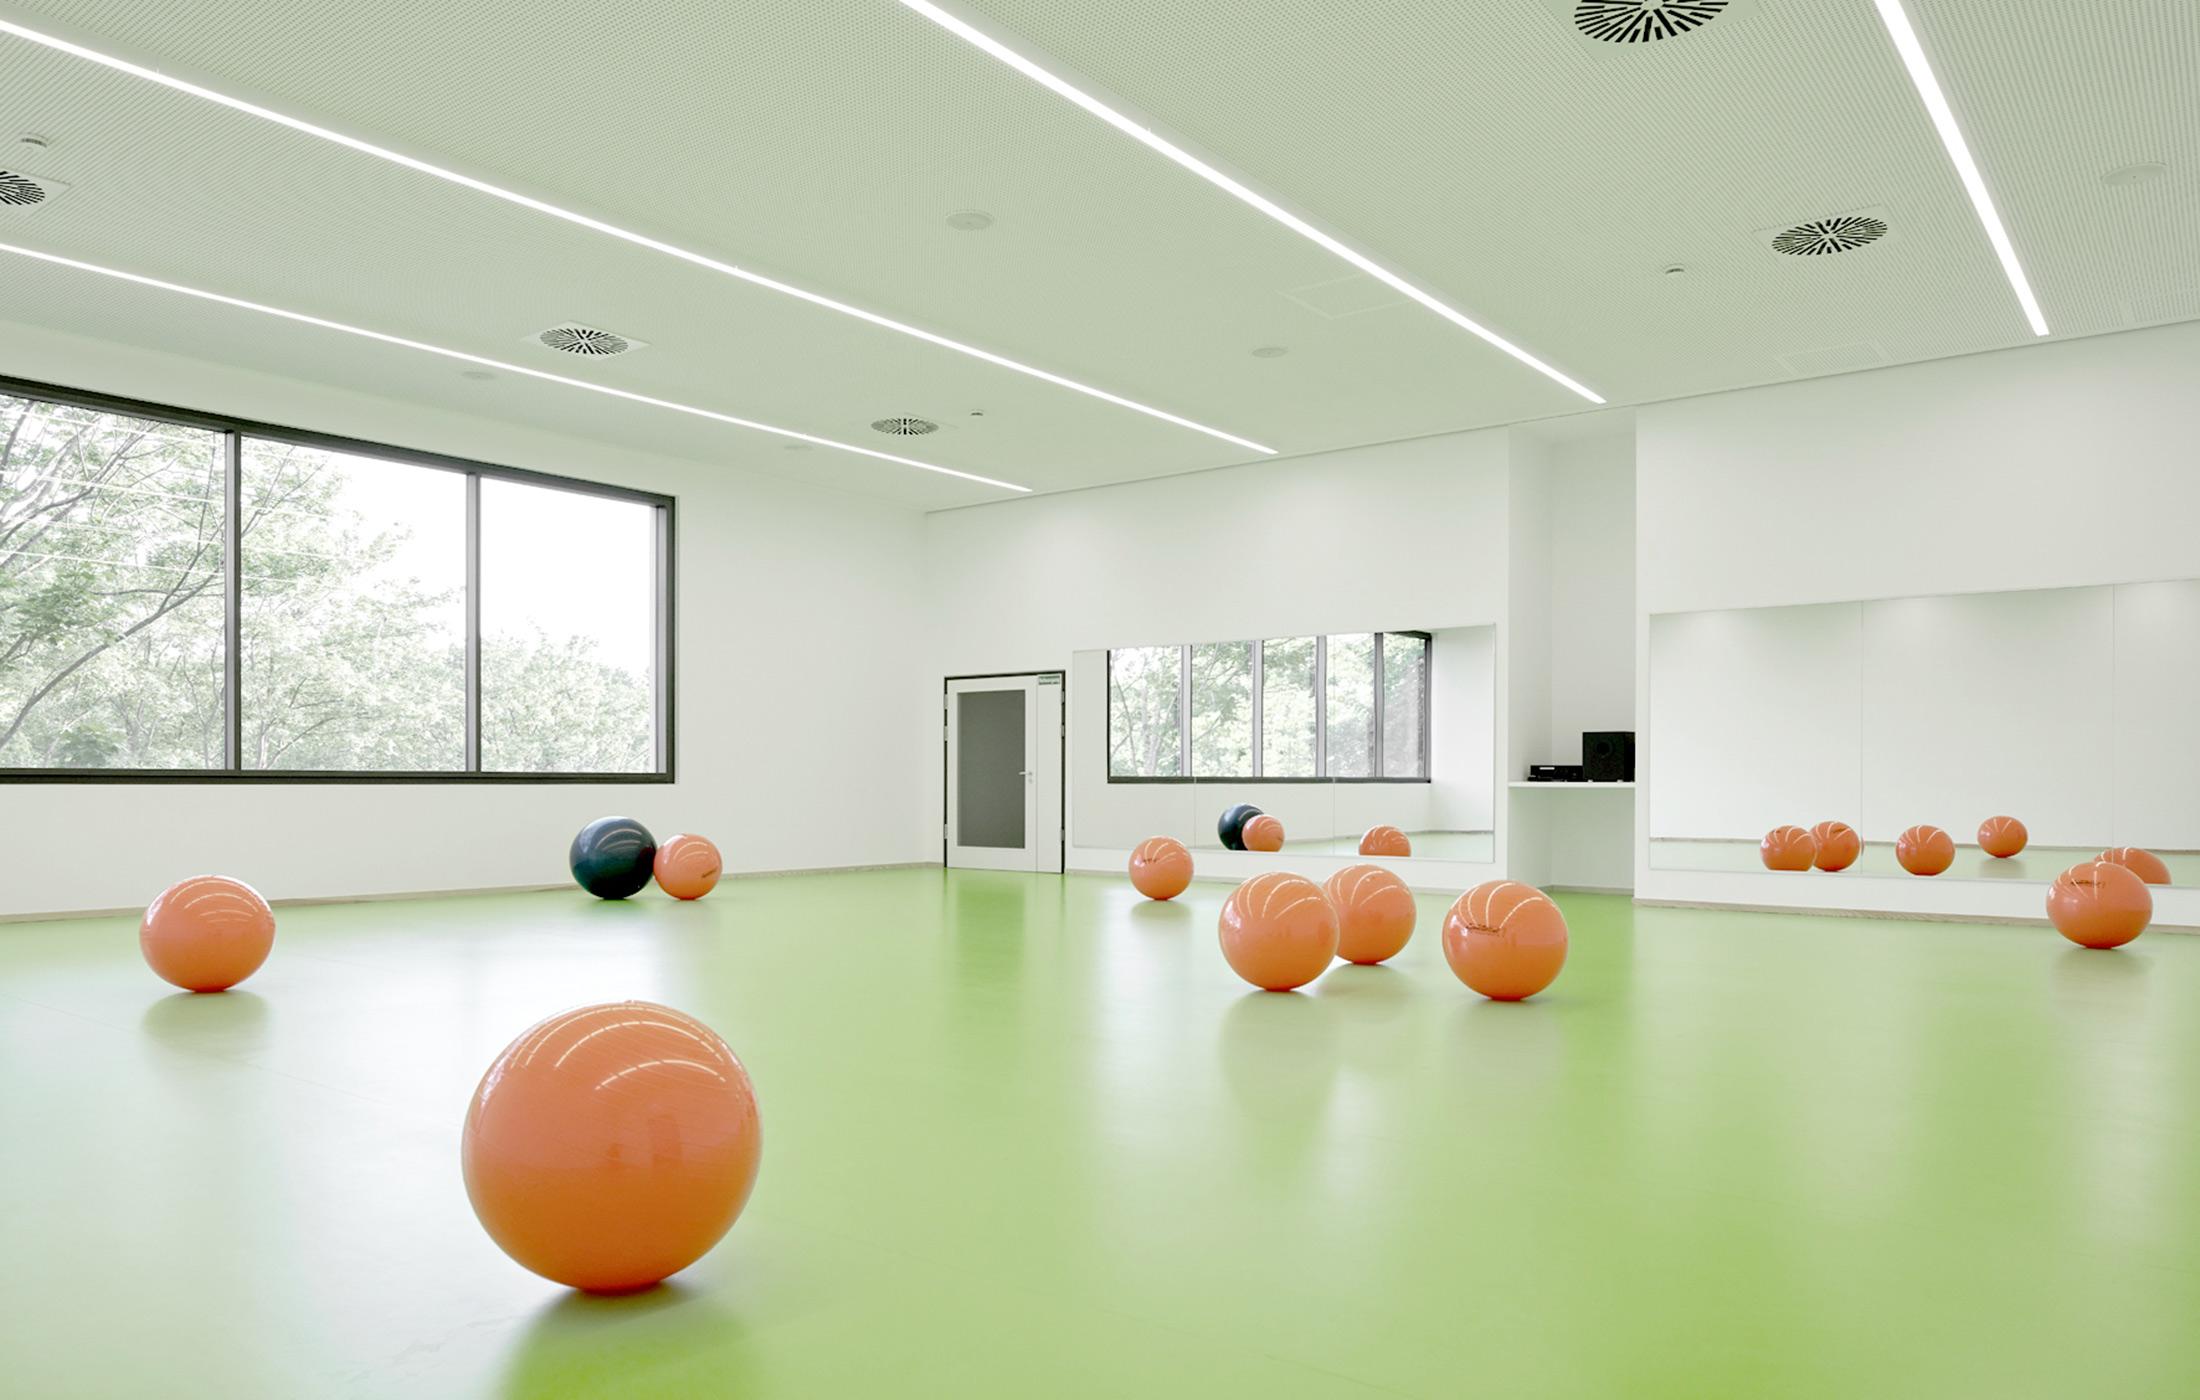 2016, Neubau Sportvereinszentrum, Böckingen